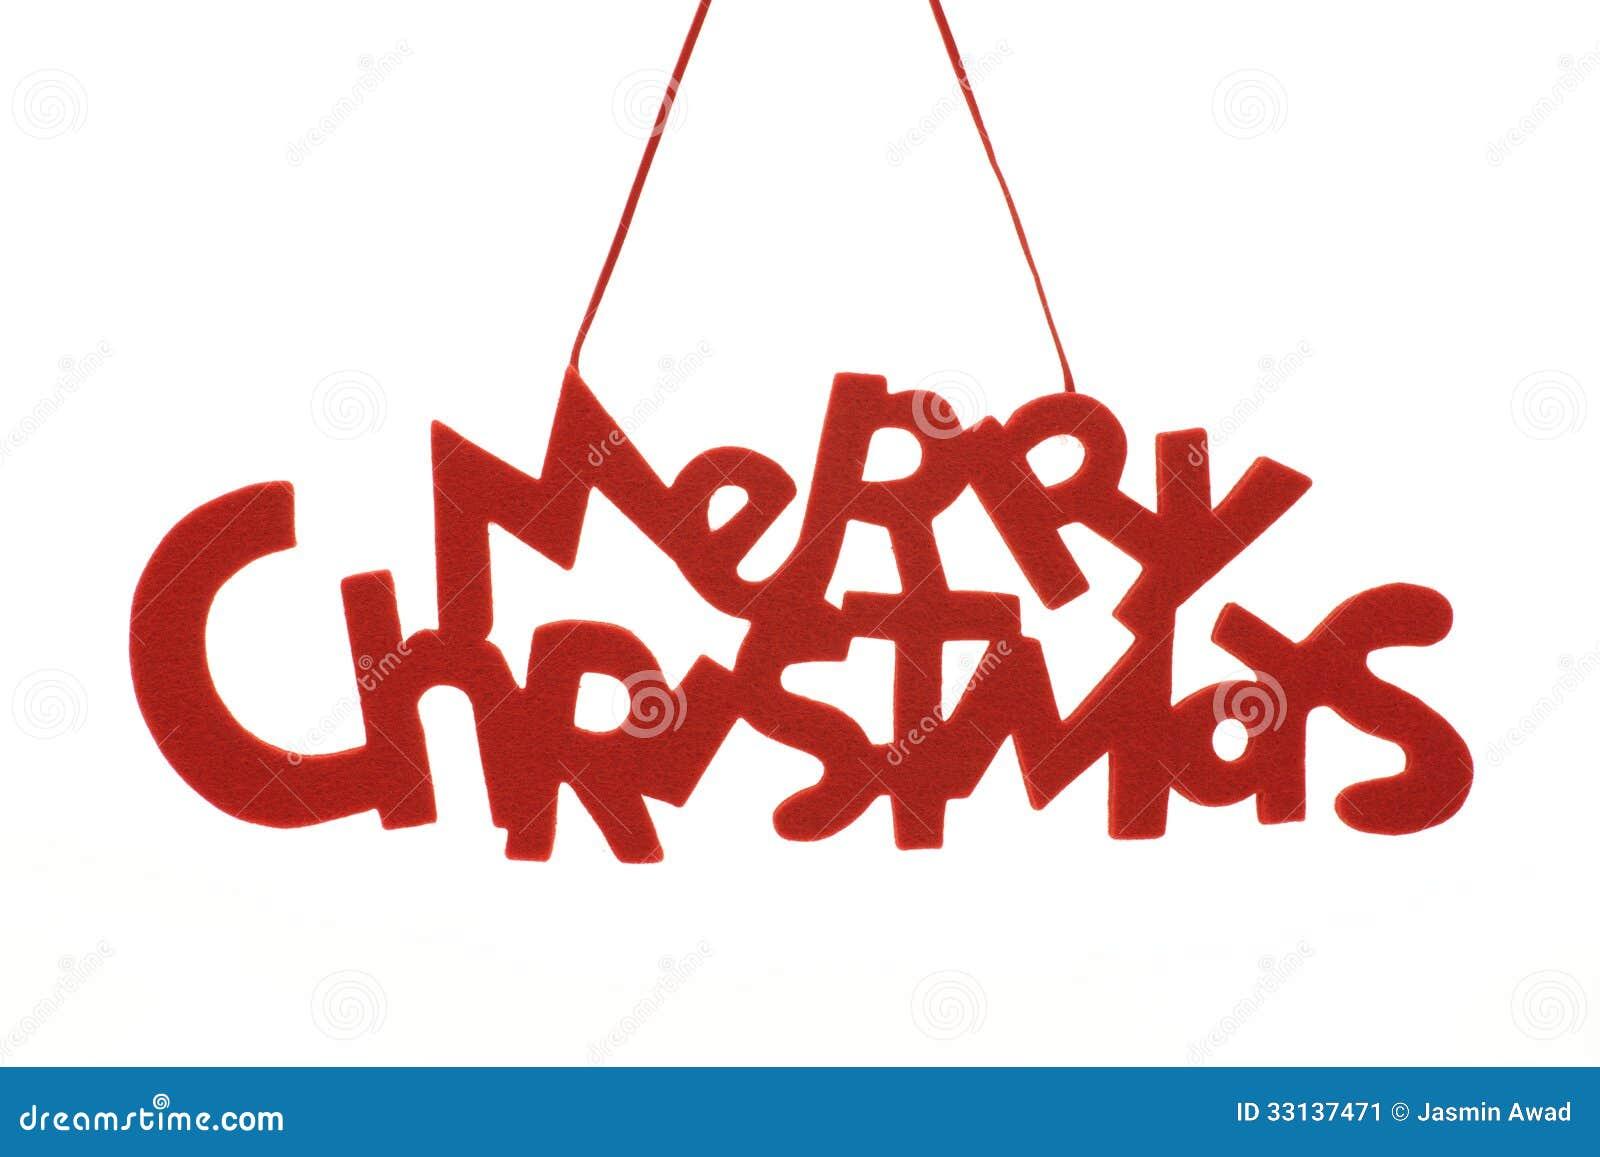 Merry Christmas Text stock image. Image of holidays, nobody - 33137471